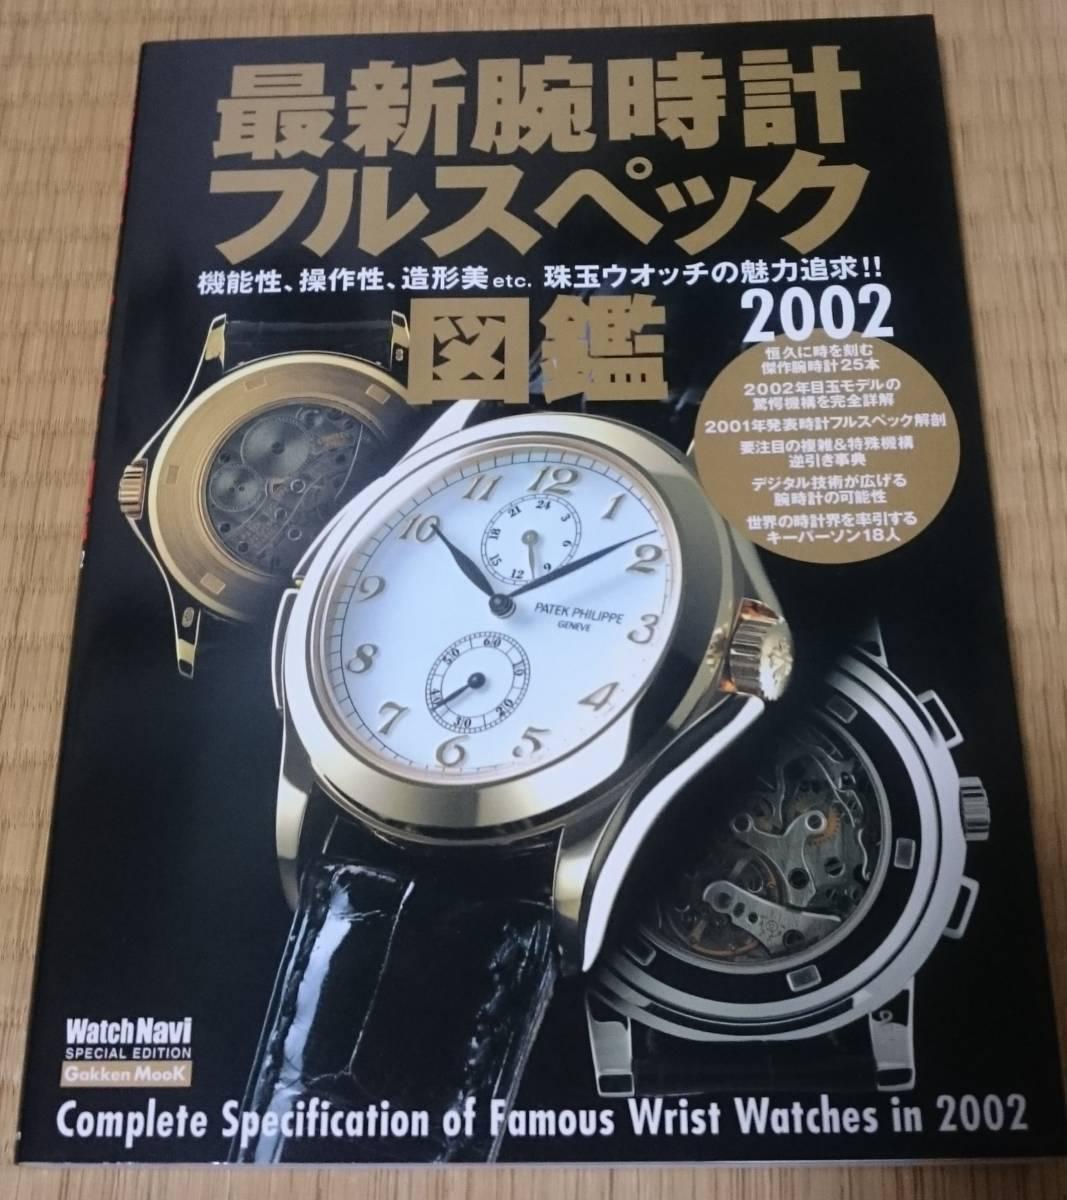 new arrival 2faad 039bc 腕時計雑誌 定価2300円 最新腕時計フルスペック図鑑2002 ...